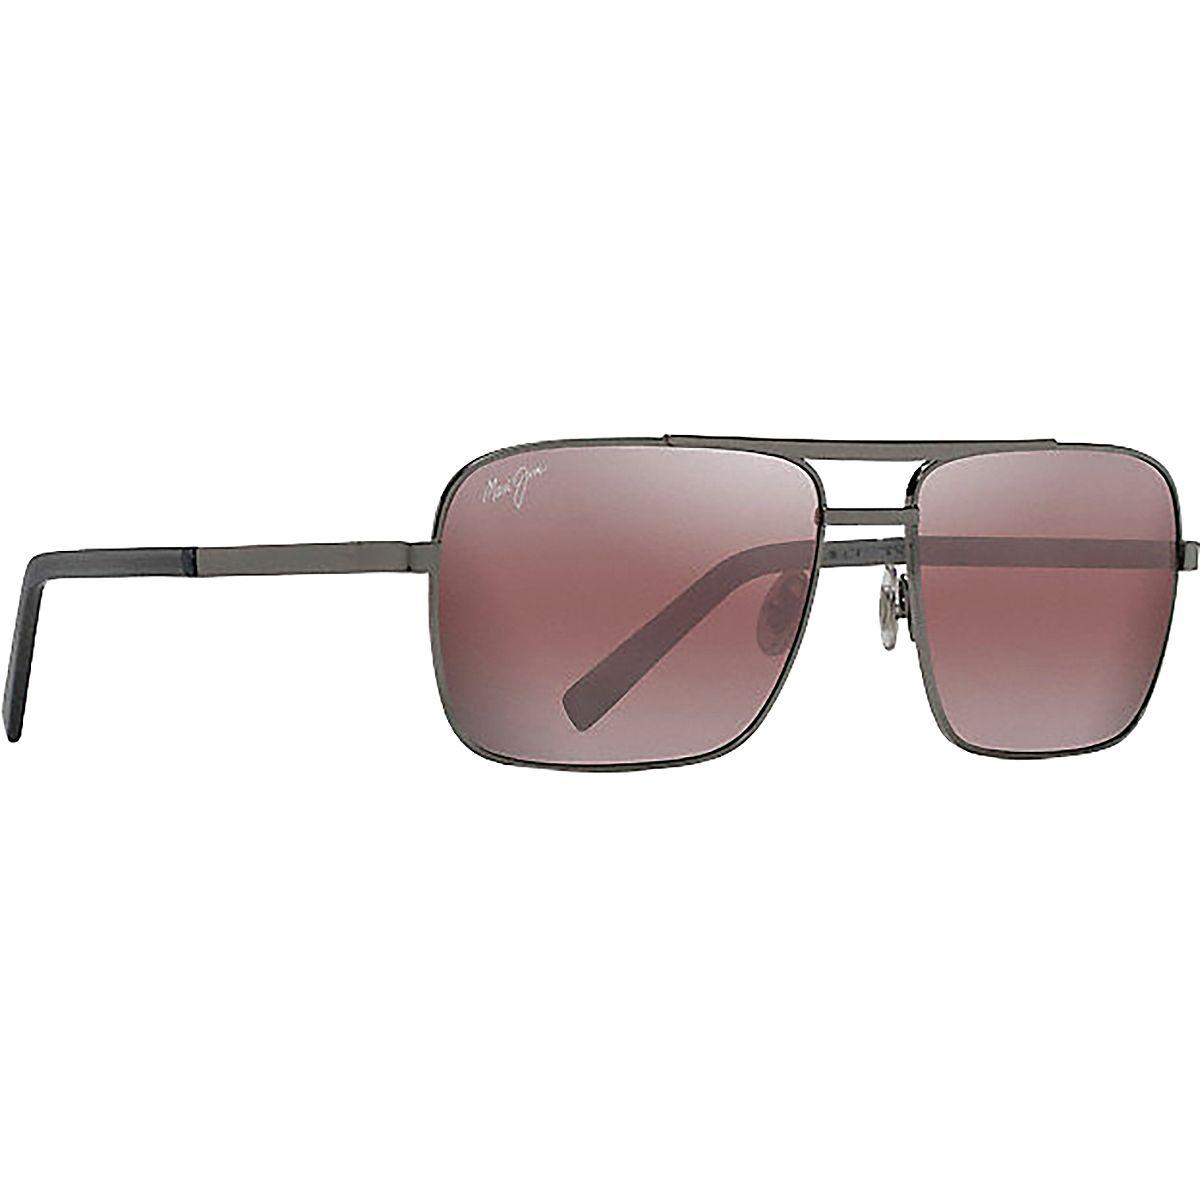 7d51270950 Lyst - Maui Jim Compass Polarized Sunglasses for Men